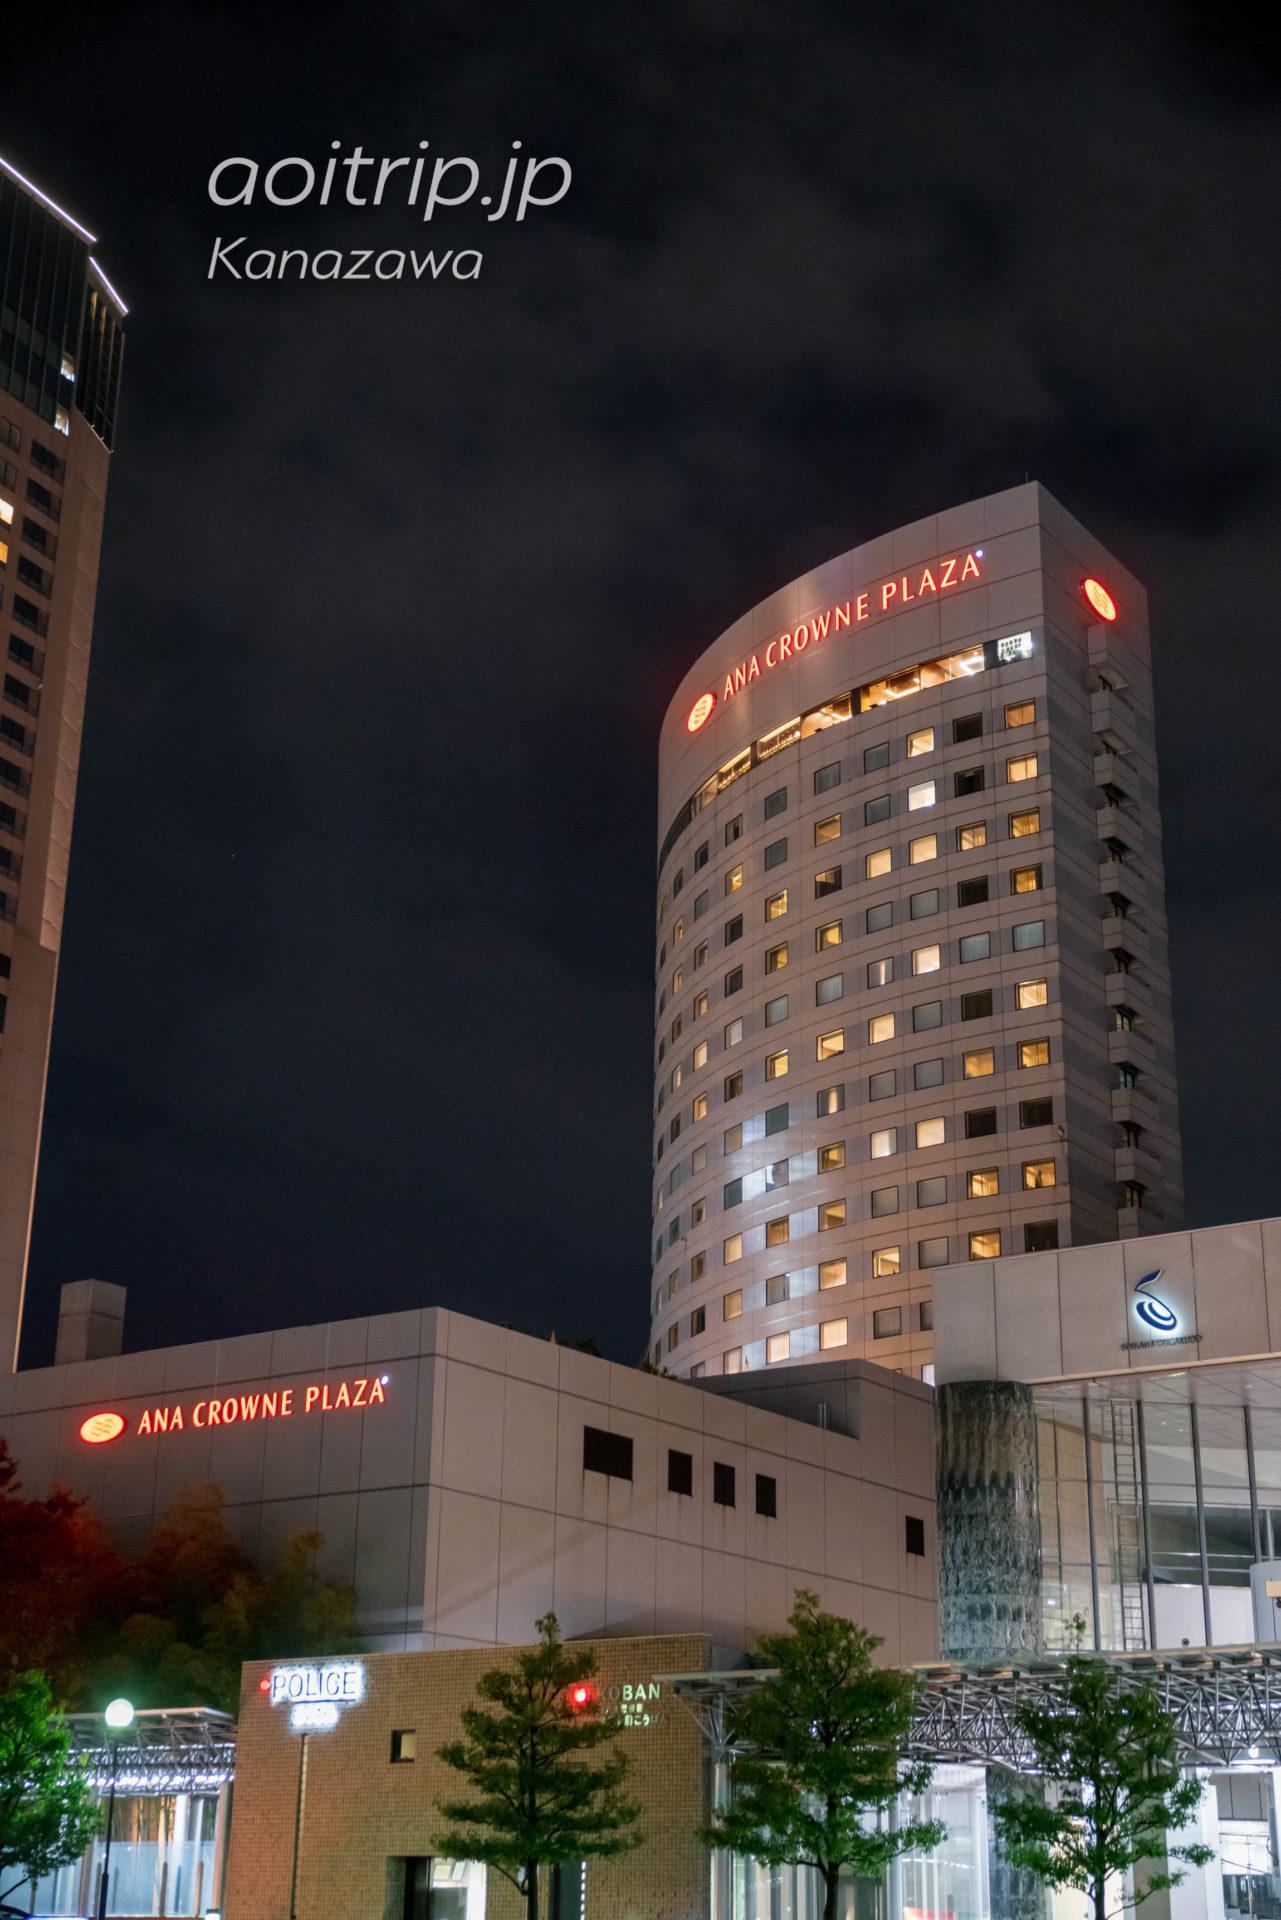 ANAクラウンプラザホテル金沢 ANA Crowne Plaza Hotel Kanazawa